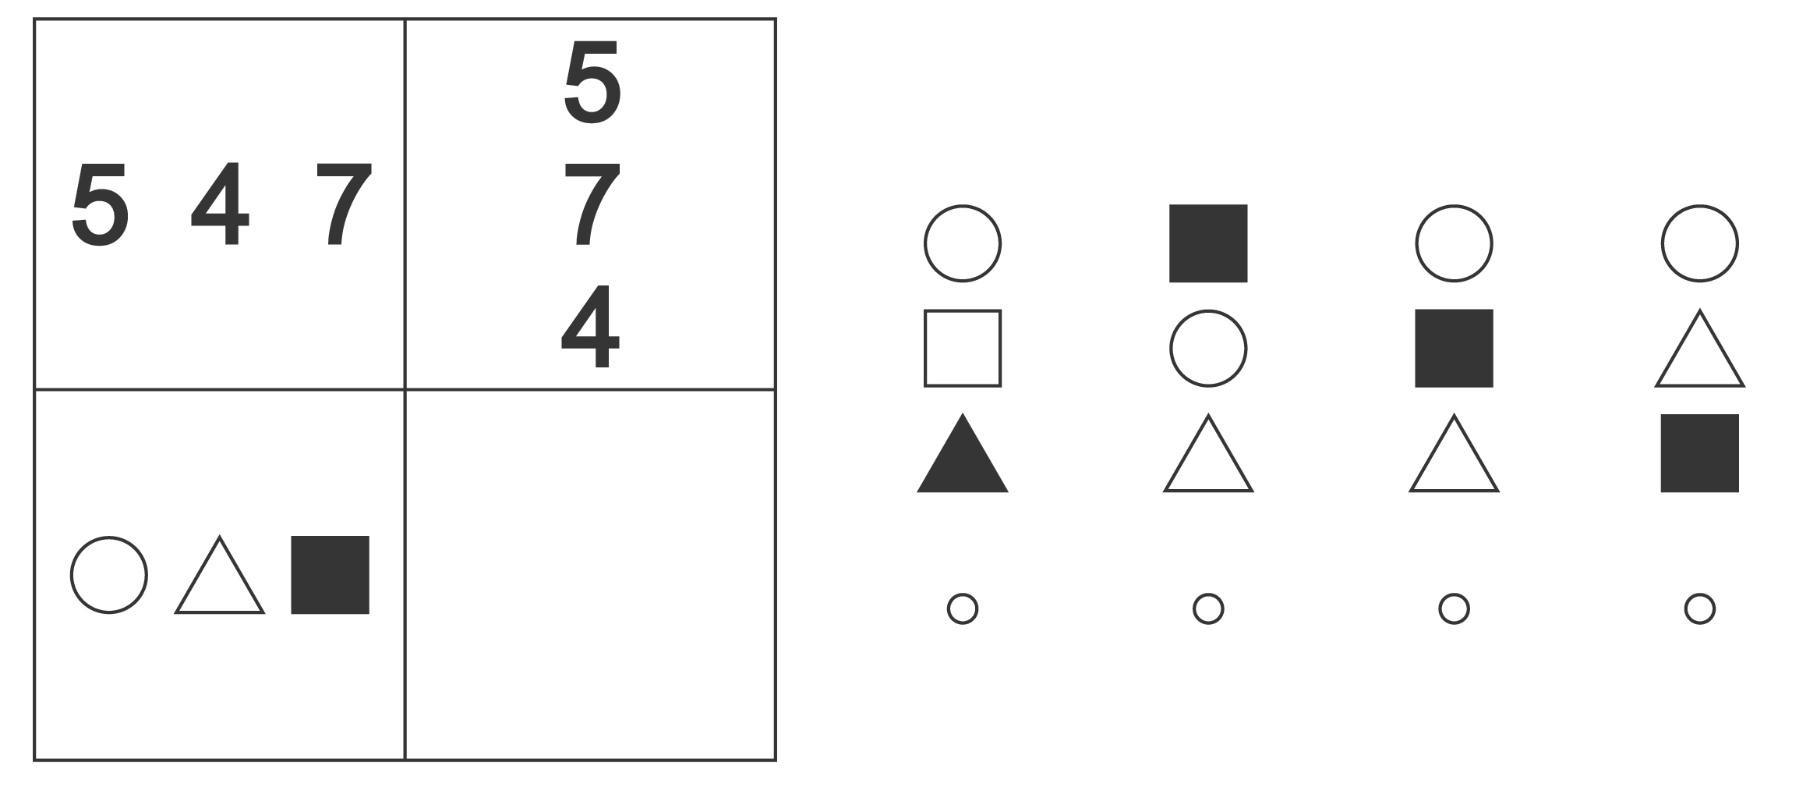 6Th Grade Math Worksheets Printables Free Printable Itbs Practice - Free Printable Itbs Practice Worksheets